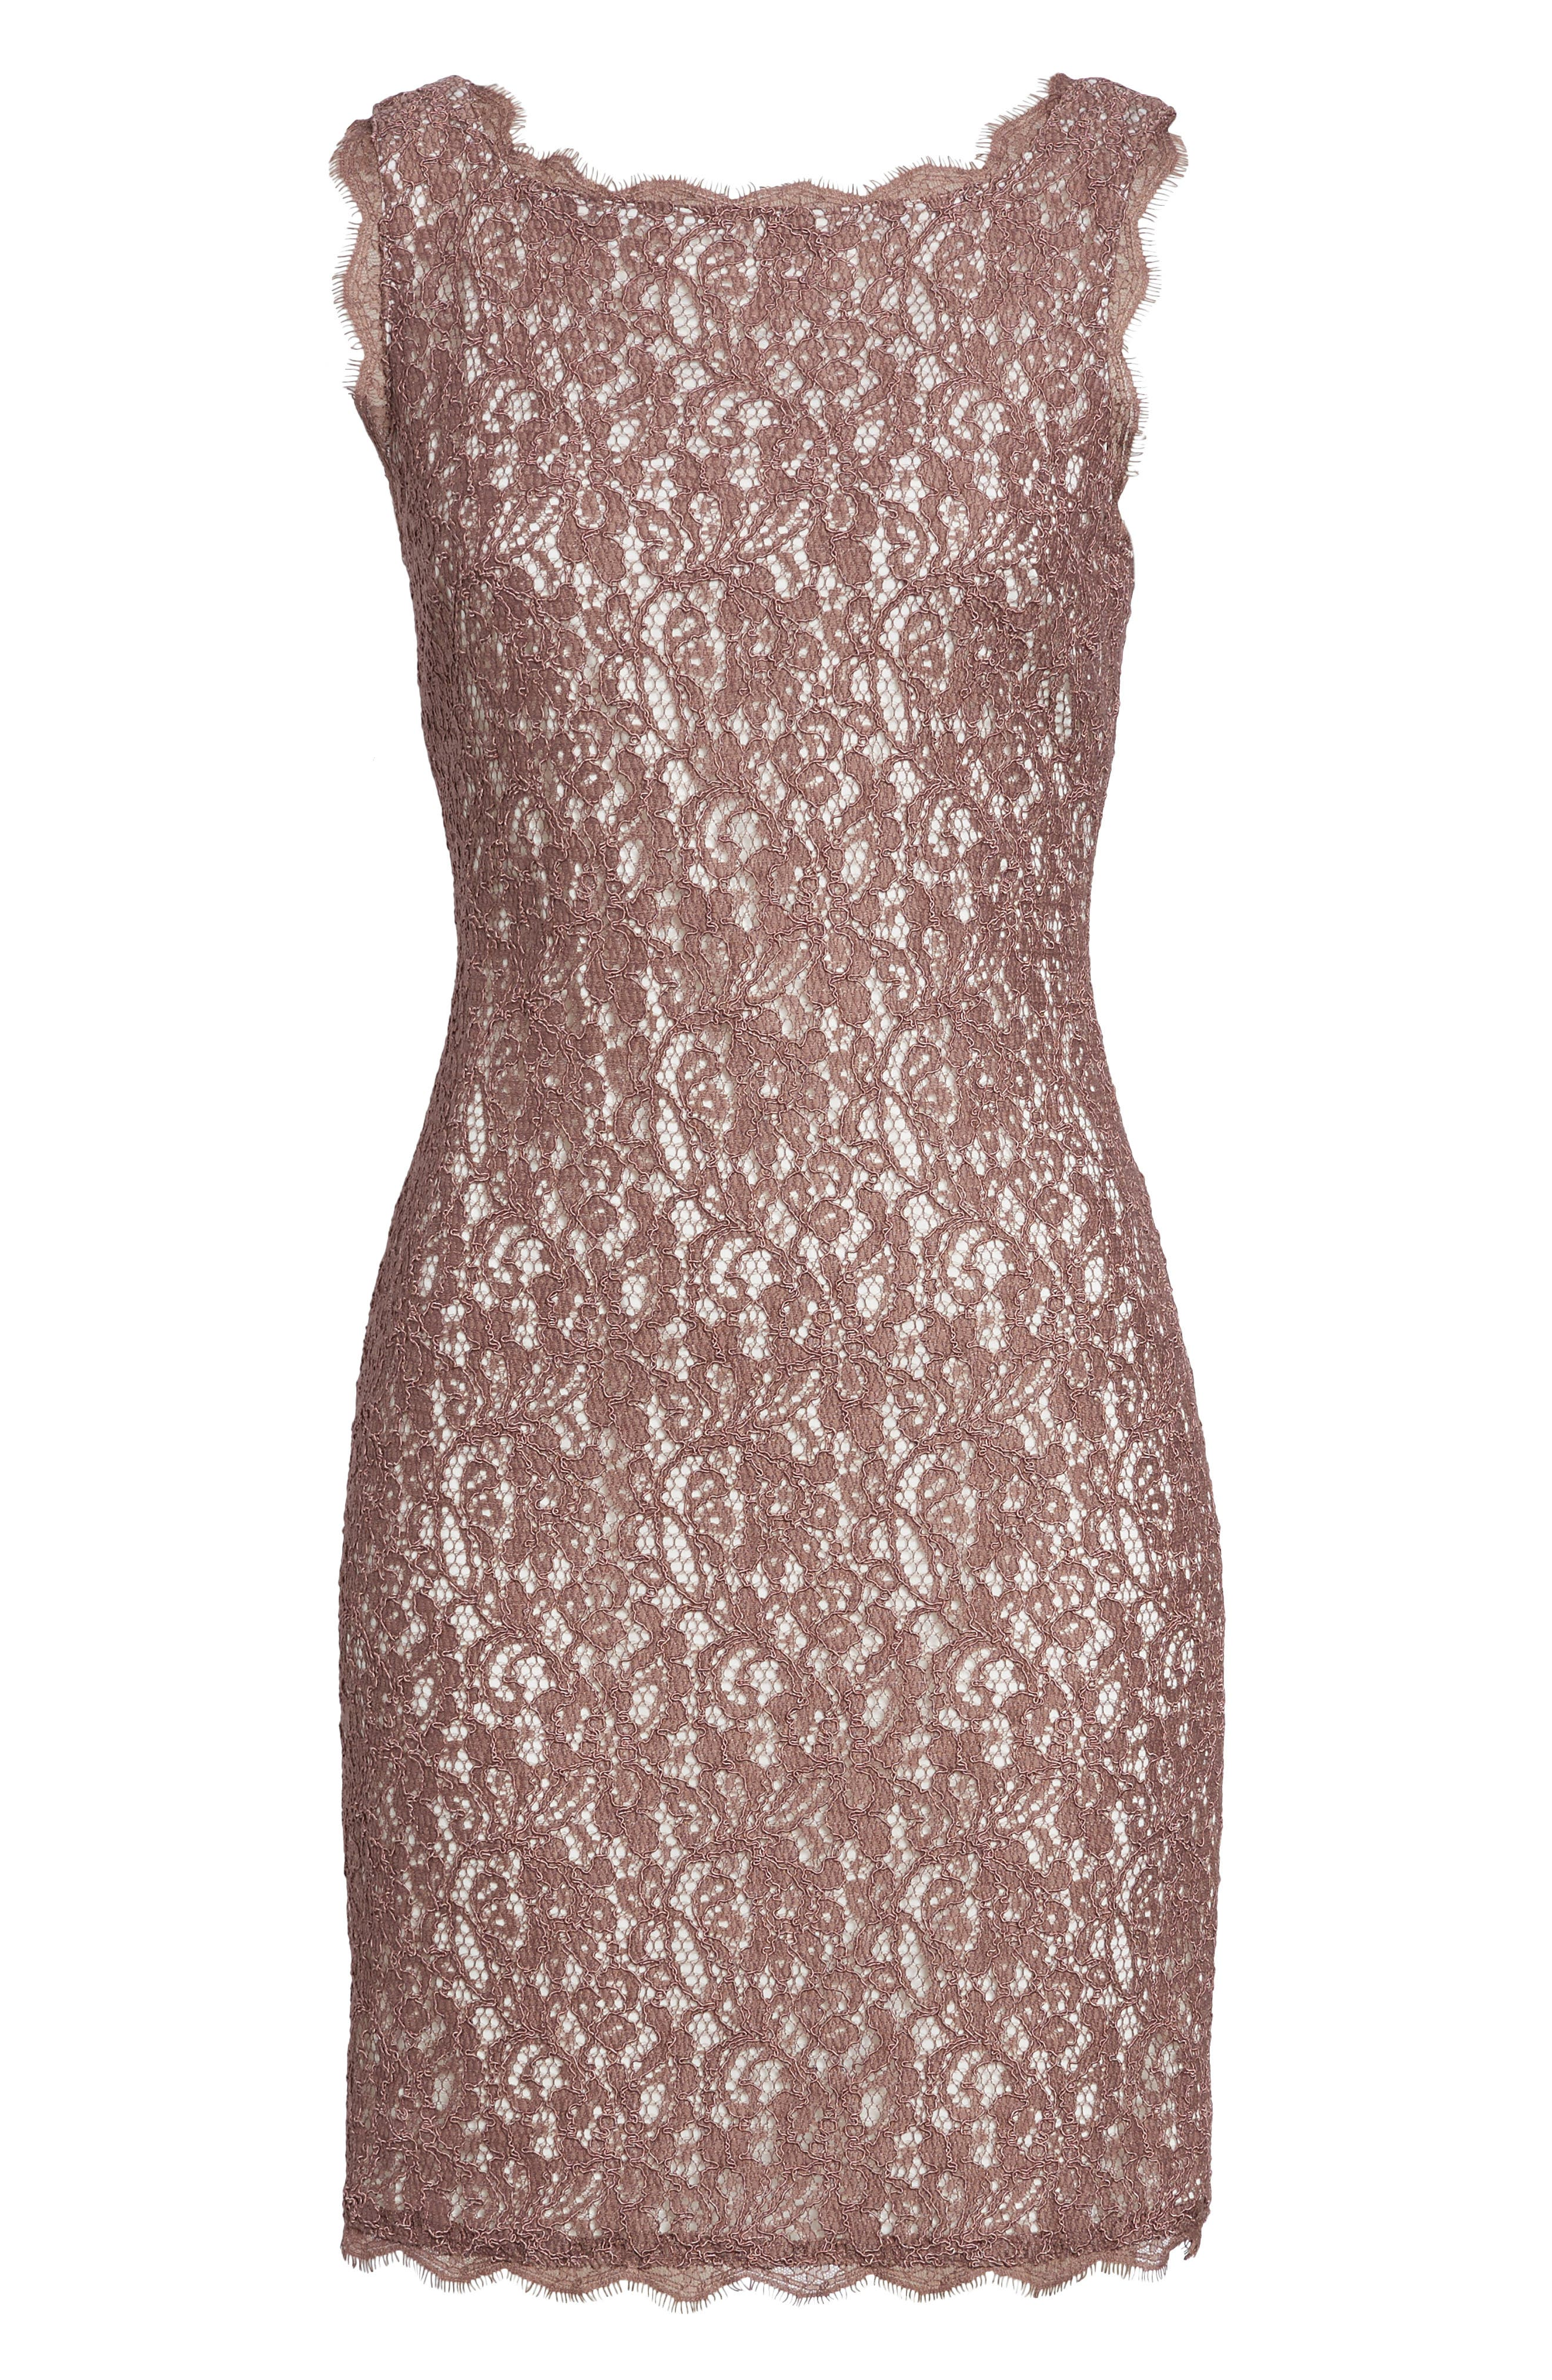 Boatneck Lace Sheath Dress,                             Alternate thumbnail 42, color,